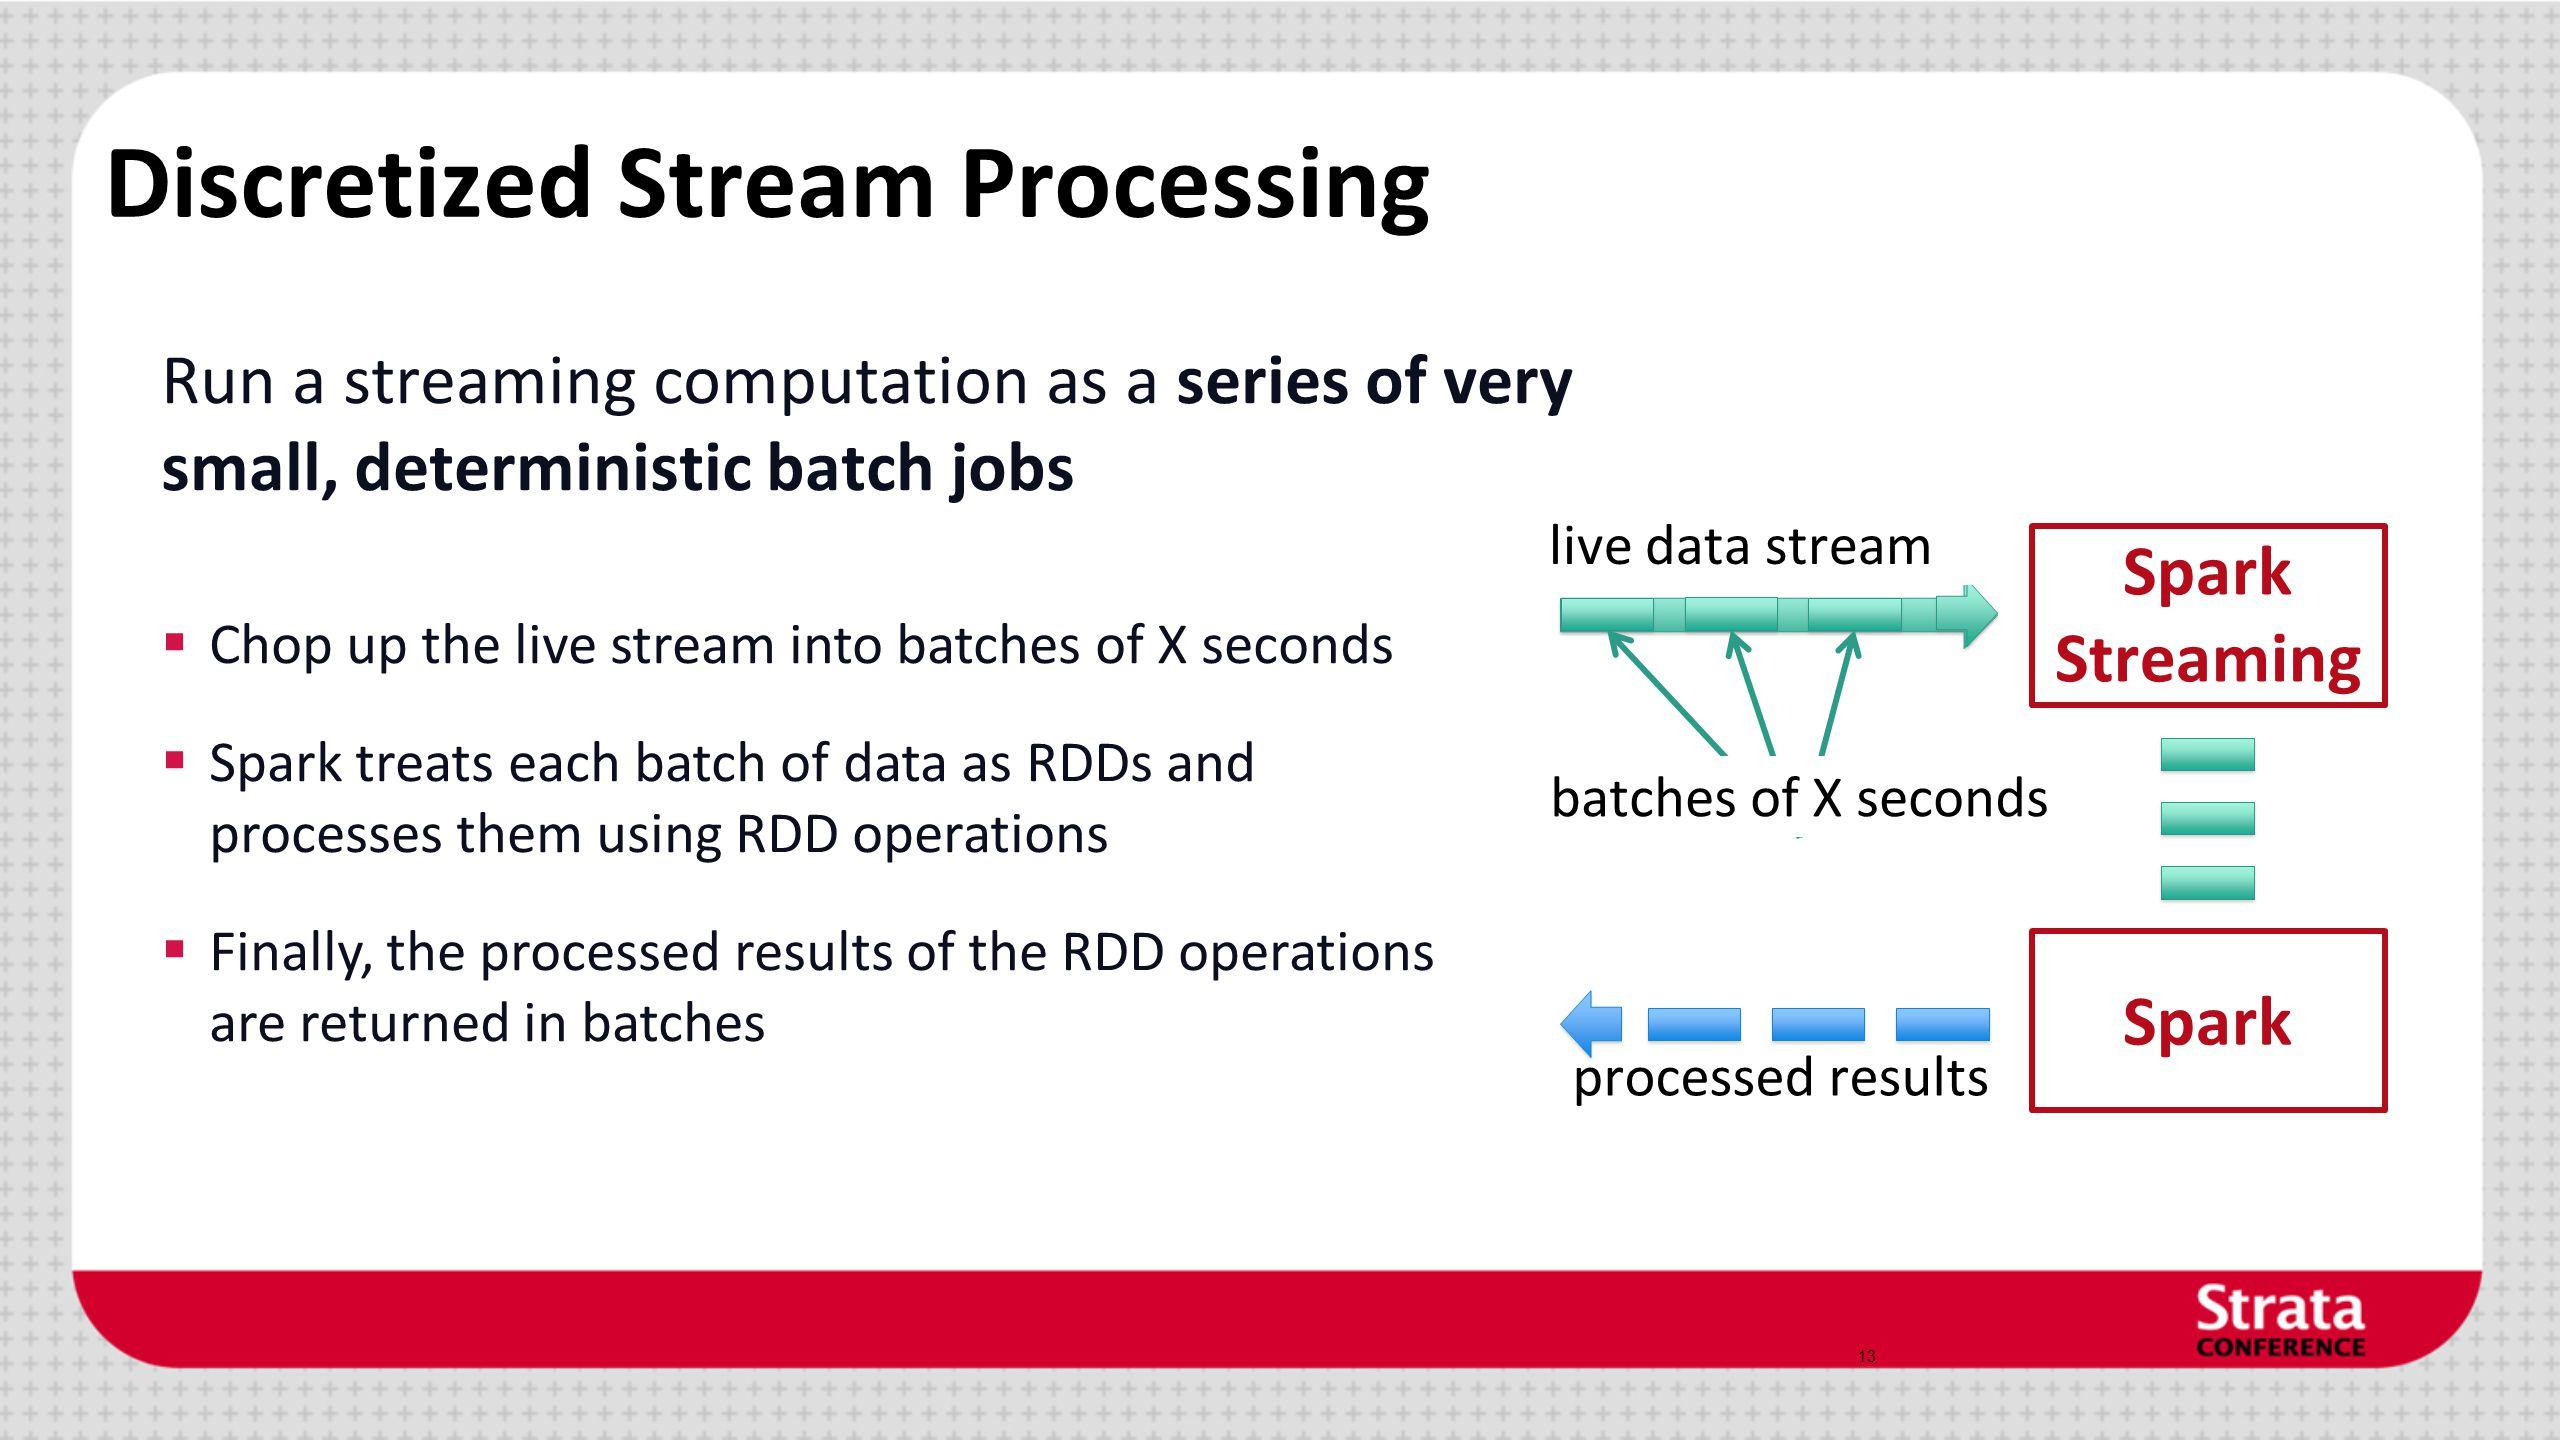 Discretized Stream Processing